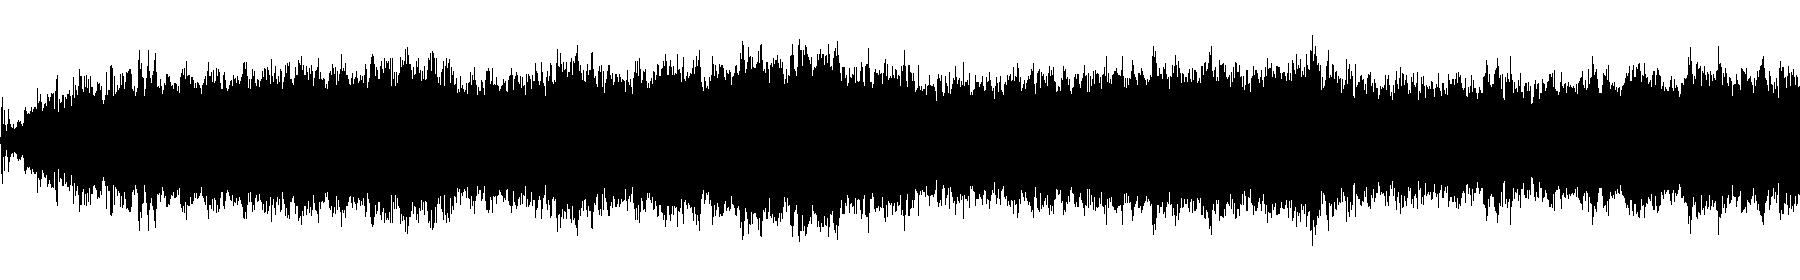 holy water choir chords   140bpm   fmin